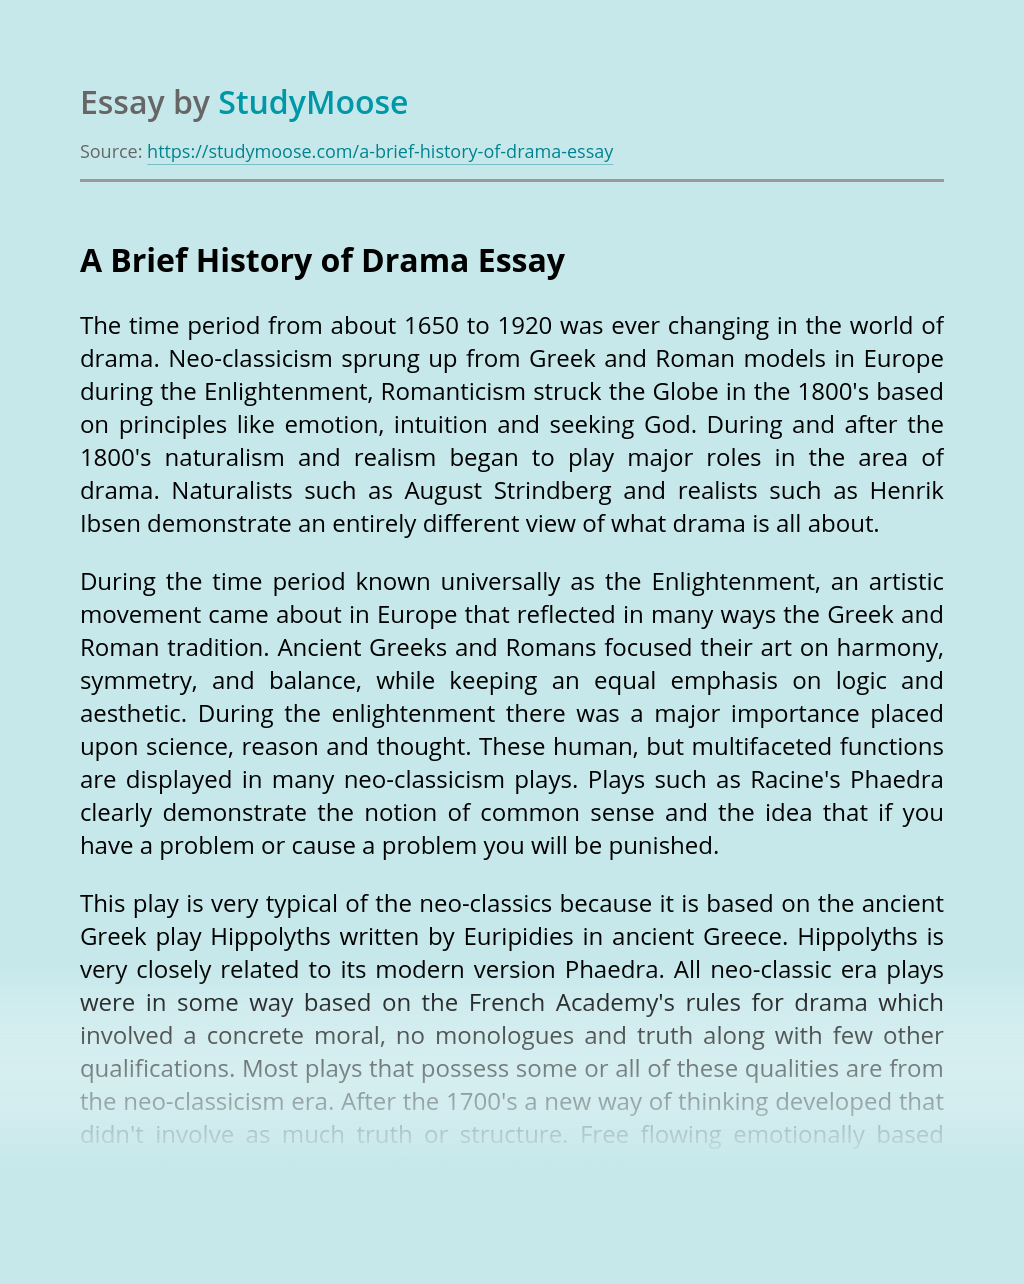 A Brief History of Drama